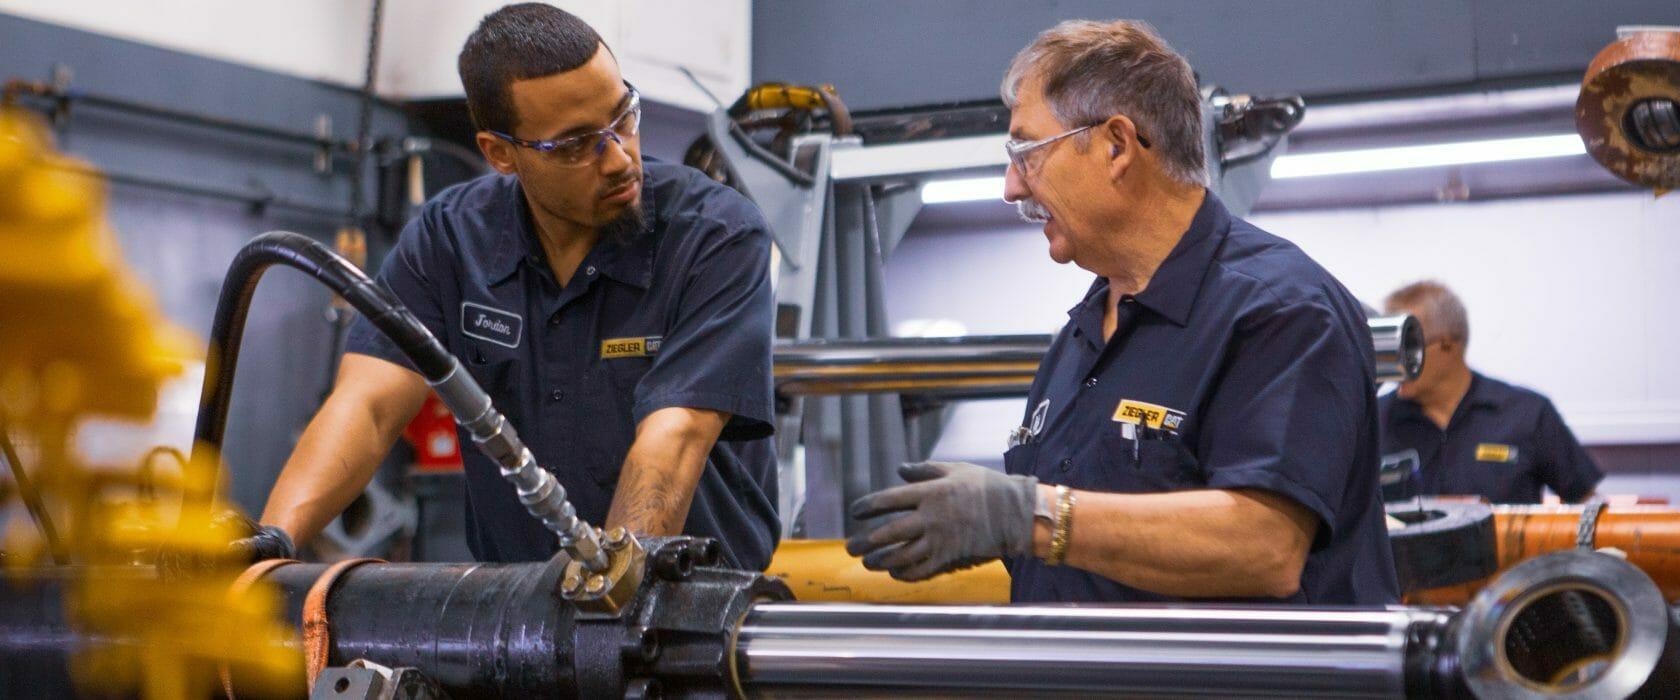 Hydraulic and Machining